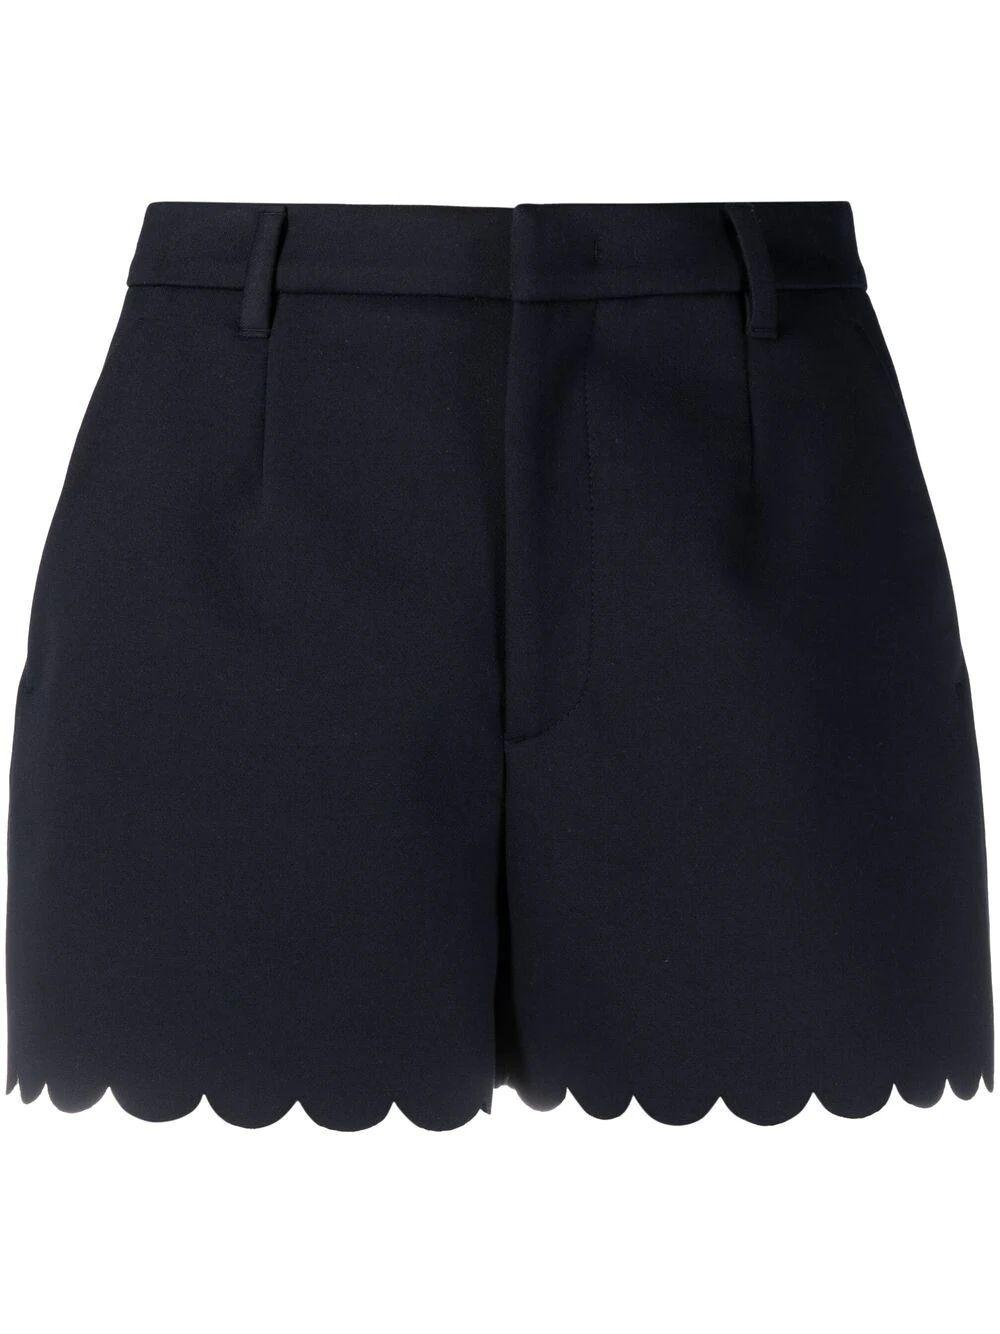 Scallop Hem Shorts Item # VR0RFF105S4